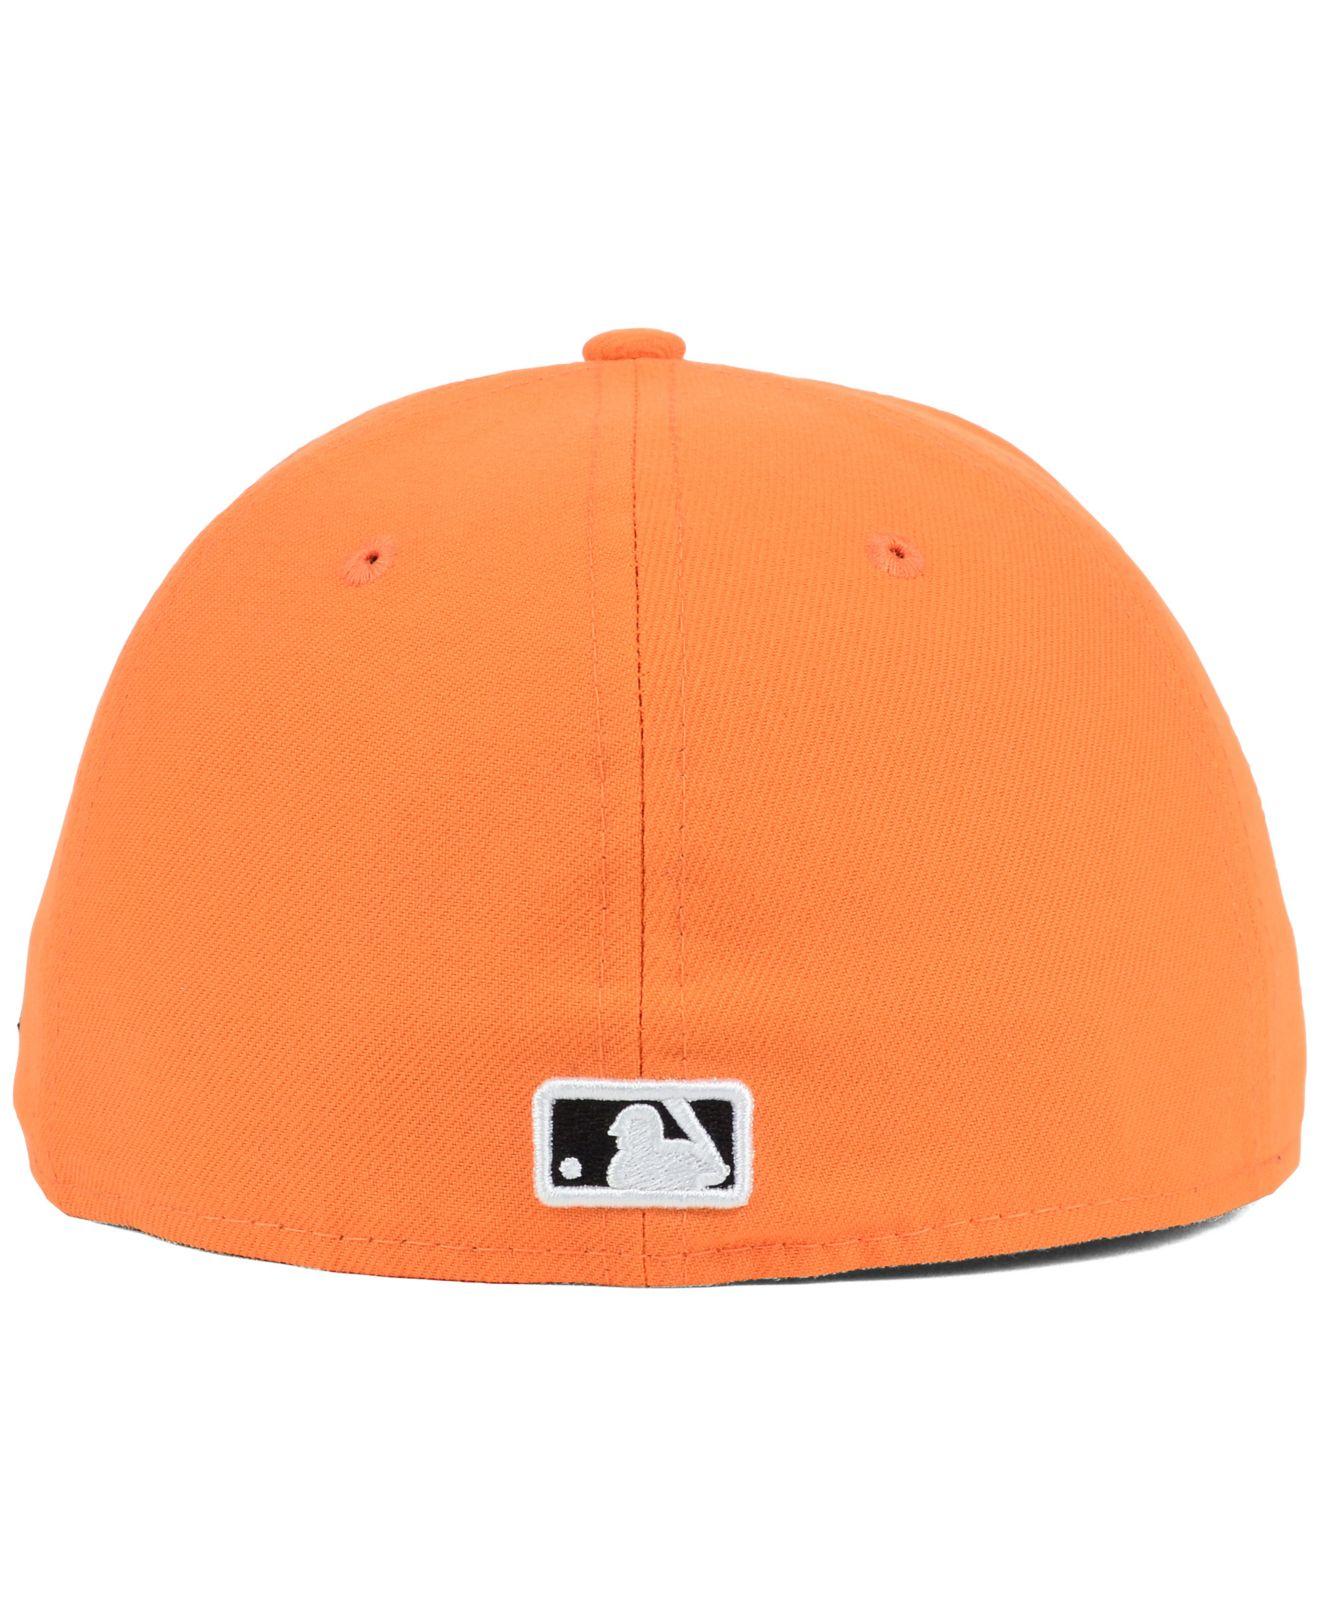 size 40 afbb3 48038 Lyst - KTZ New York Yankees C-Dub 59Fifty Cap in Orange